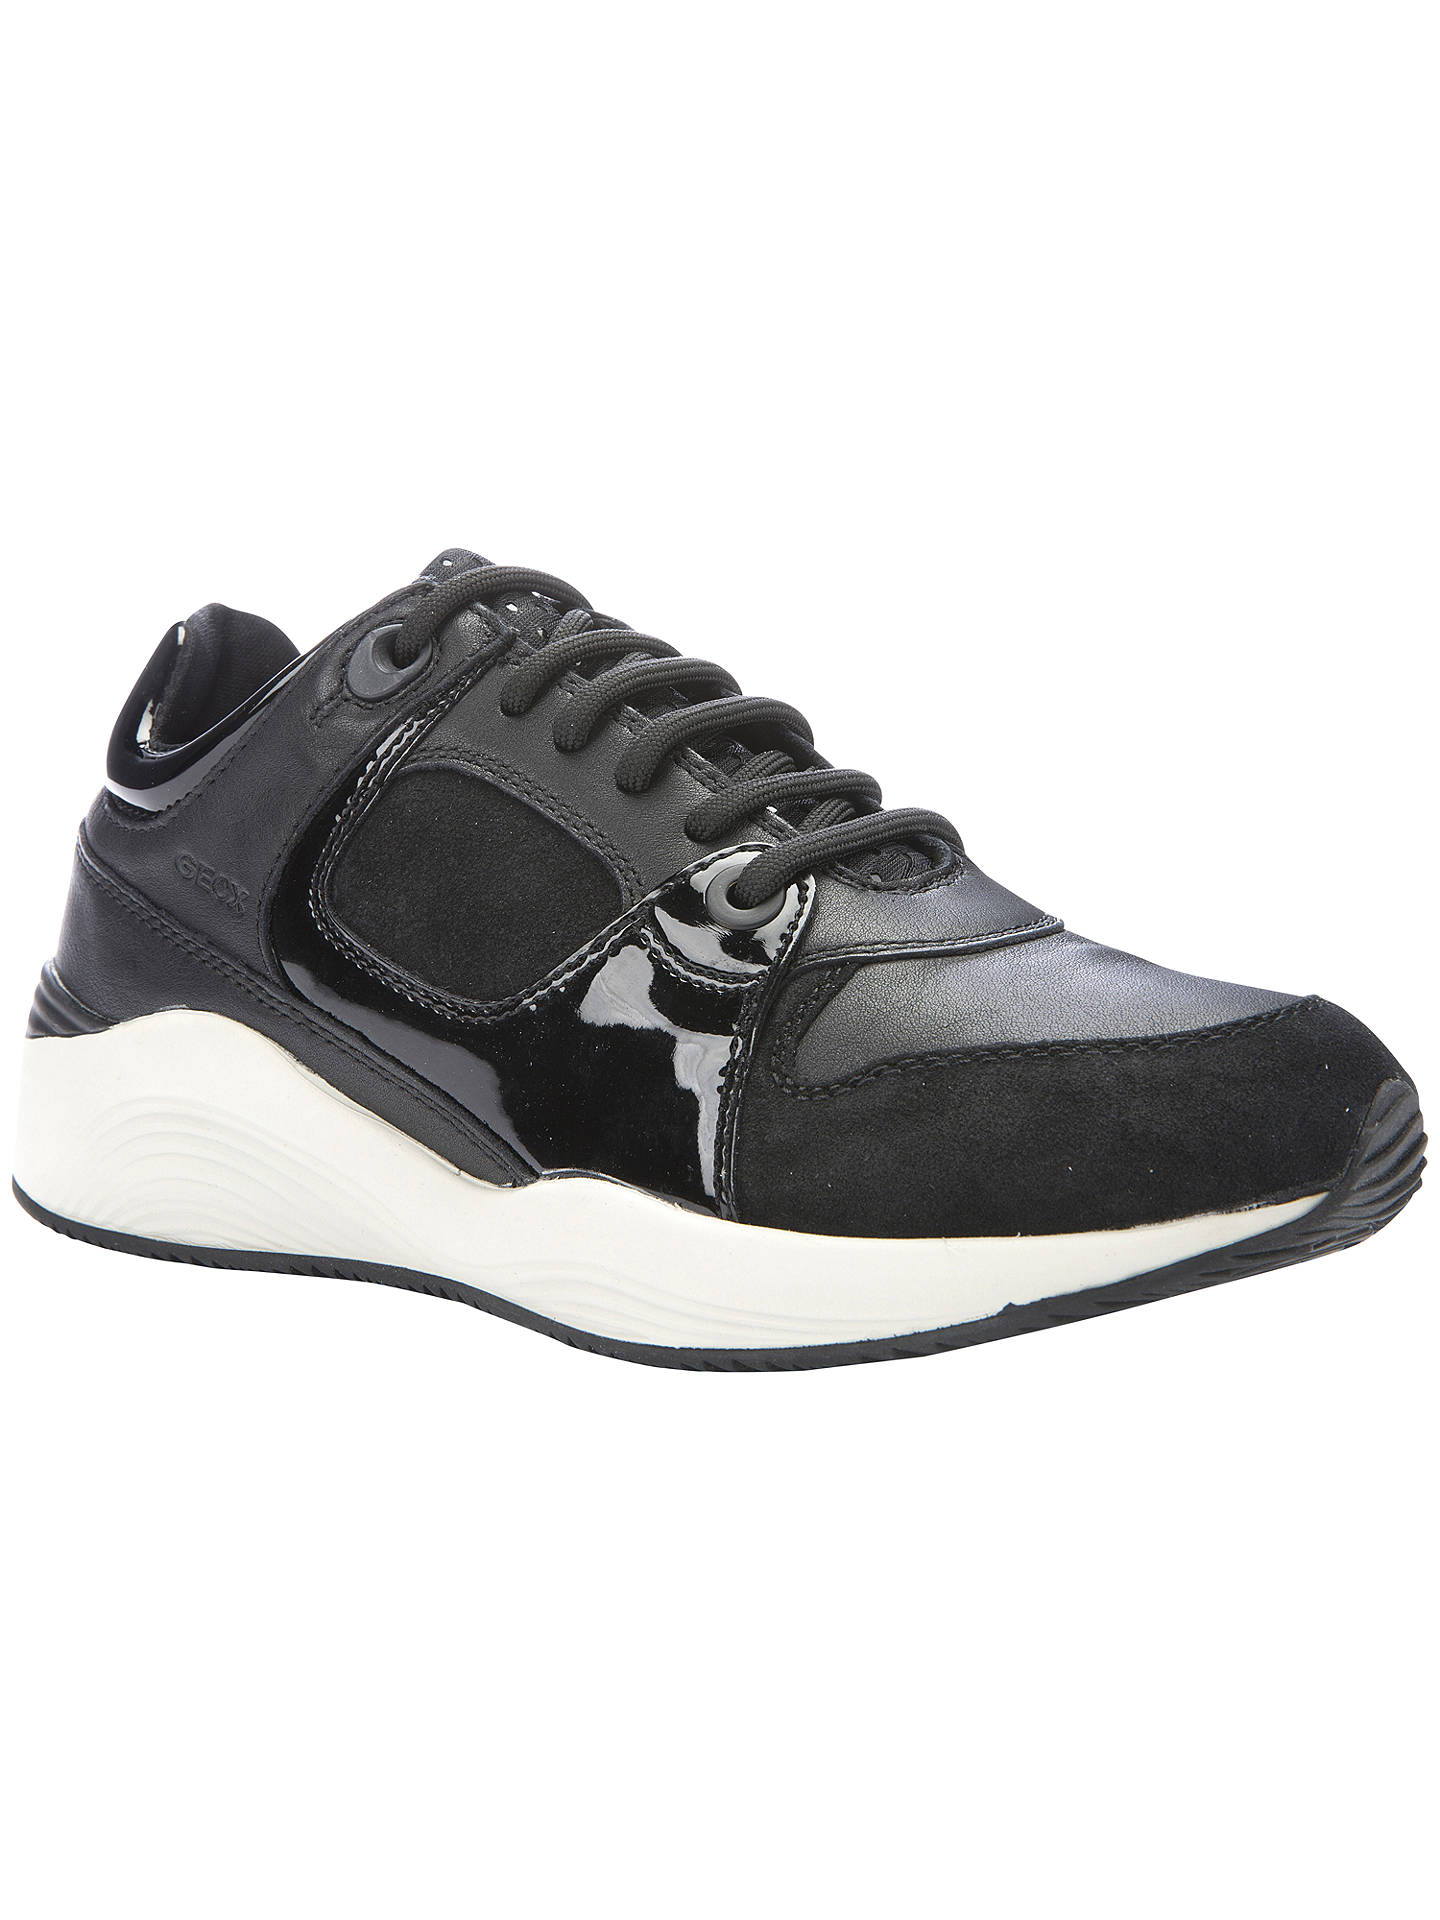 89117cc16dfa7 Buy Geox Omaya Flat Lace Up Trainers, Black/White, 4 Online at johnlewis ...